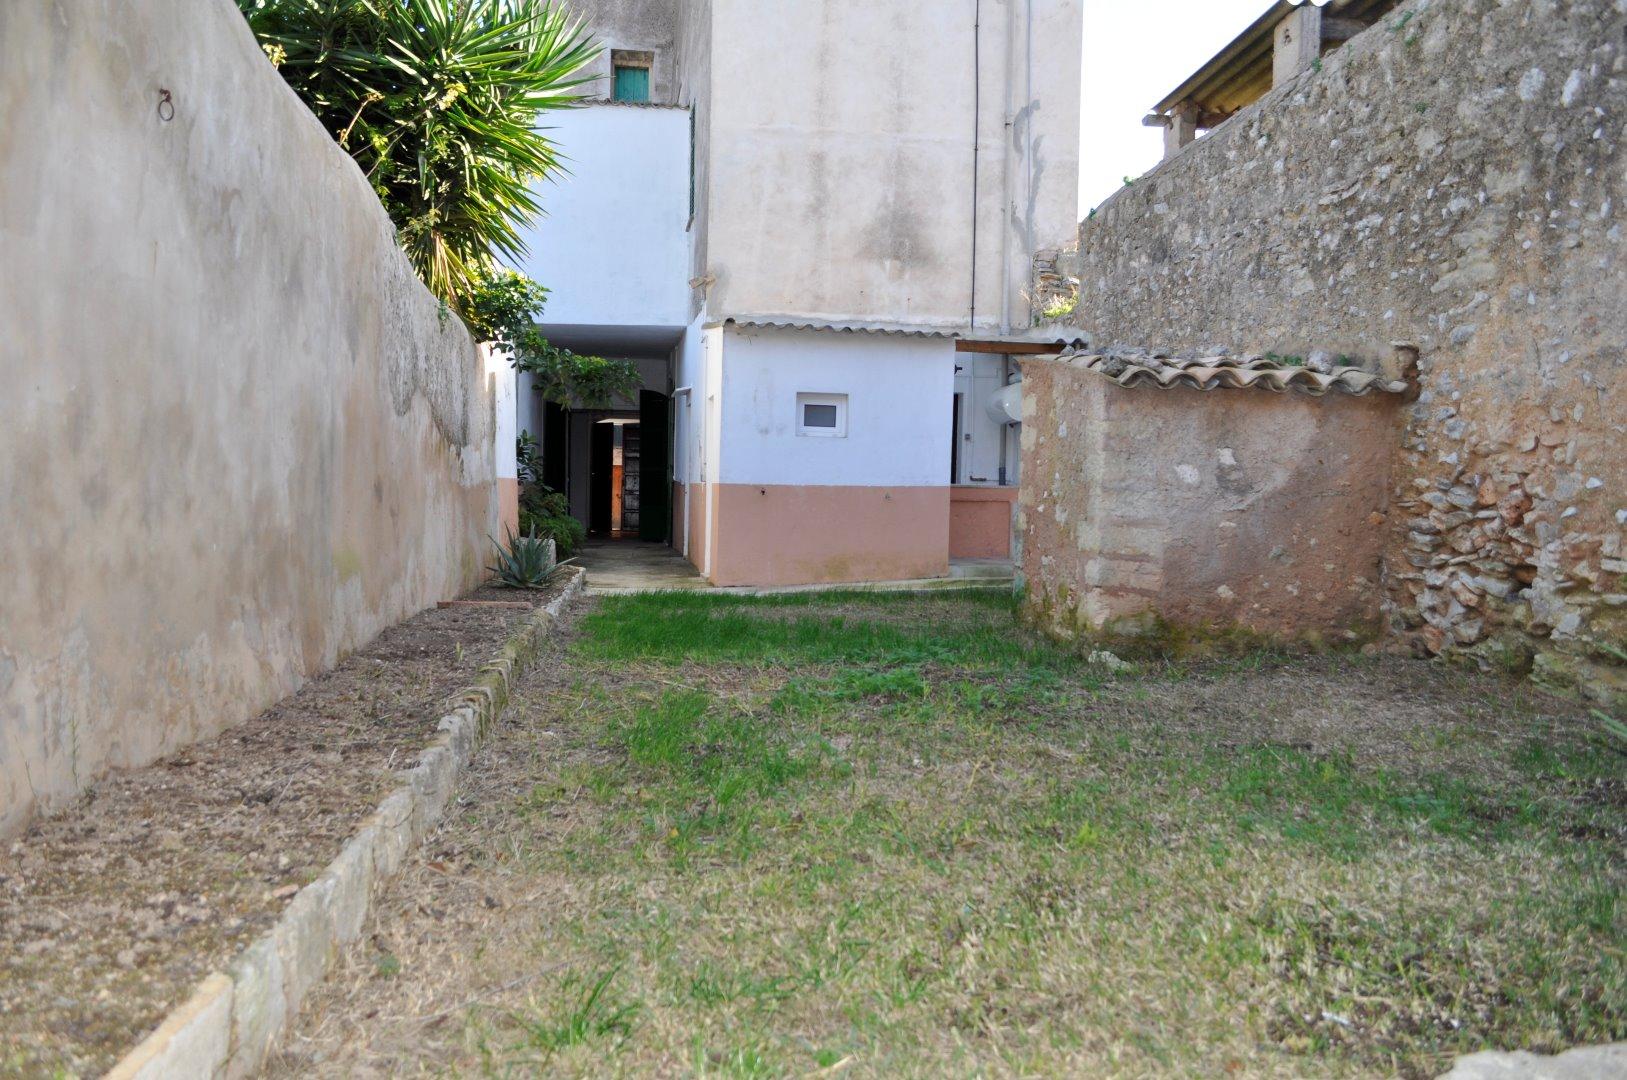 Location Maison  Carrer d'antoni maura, 15